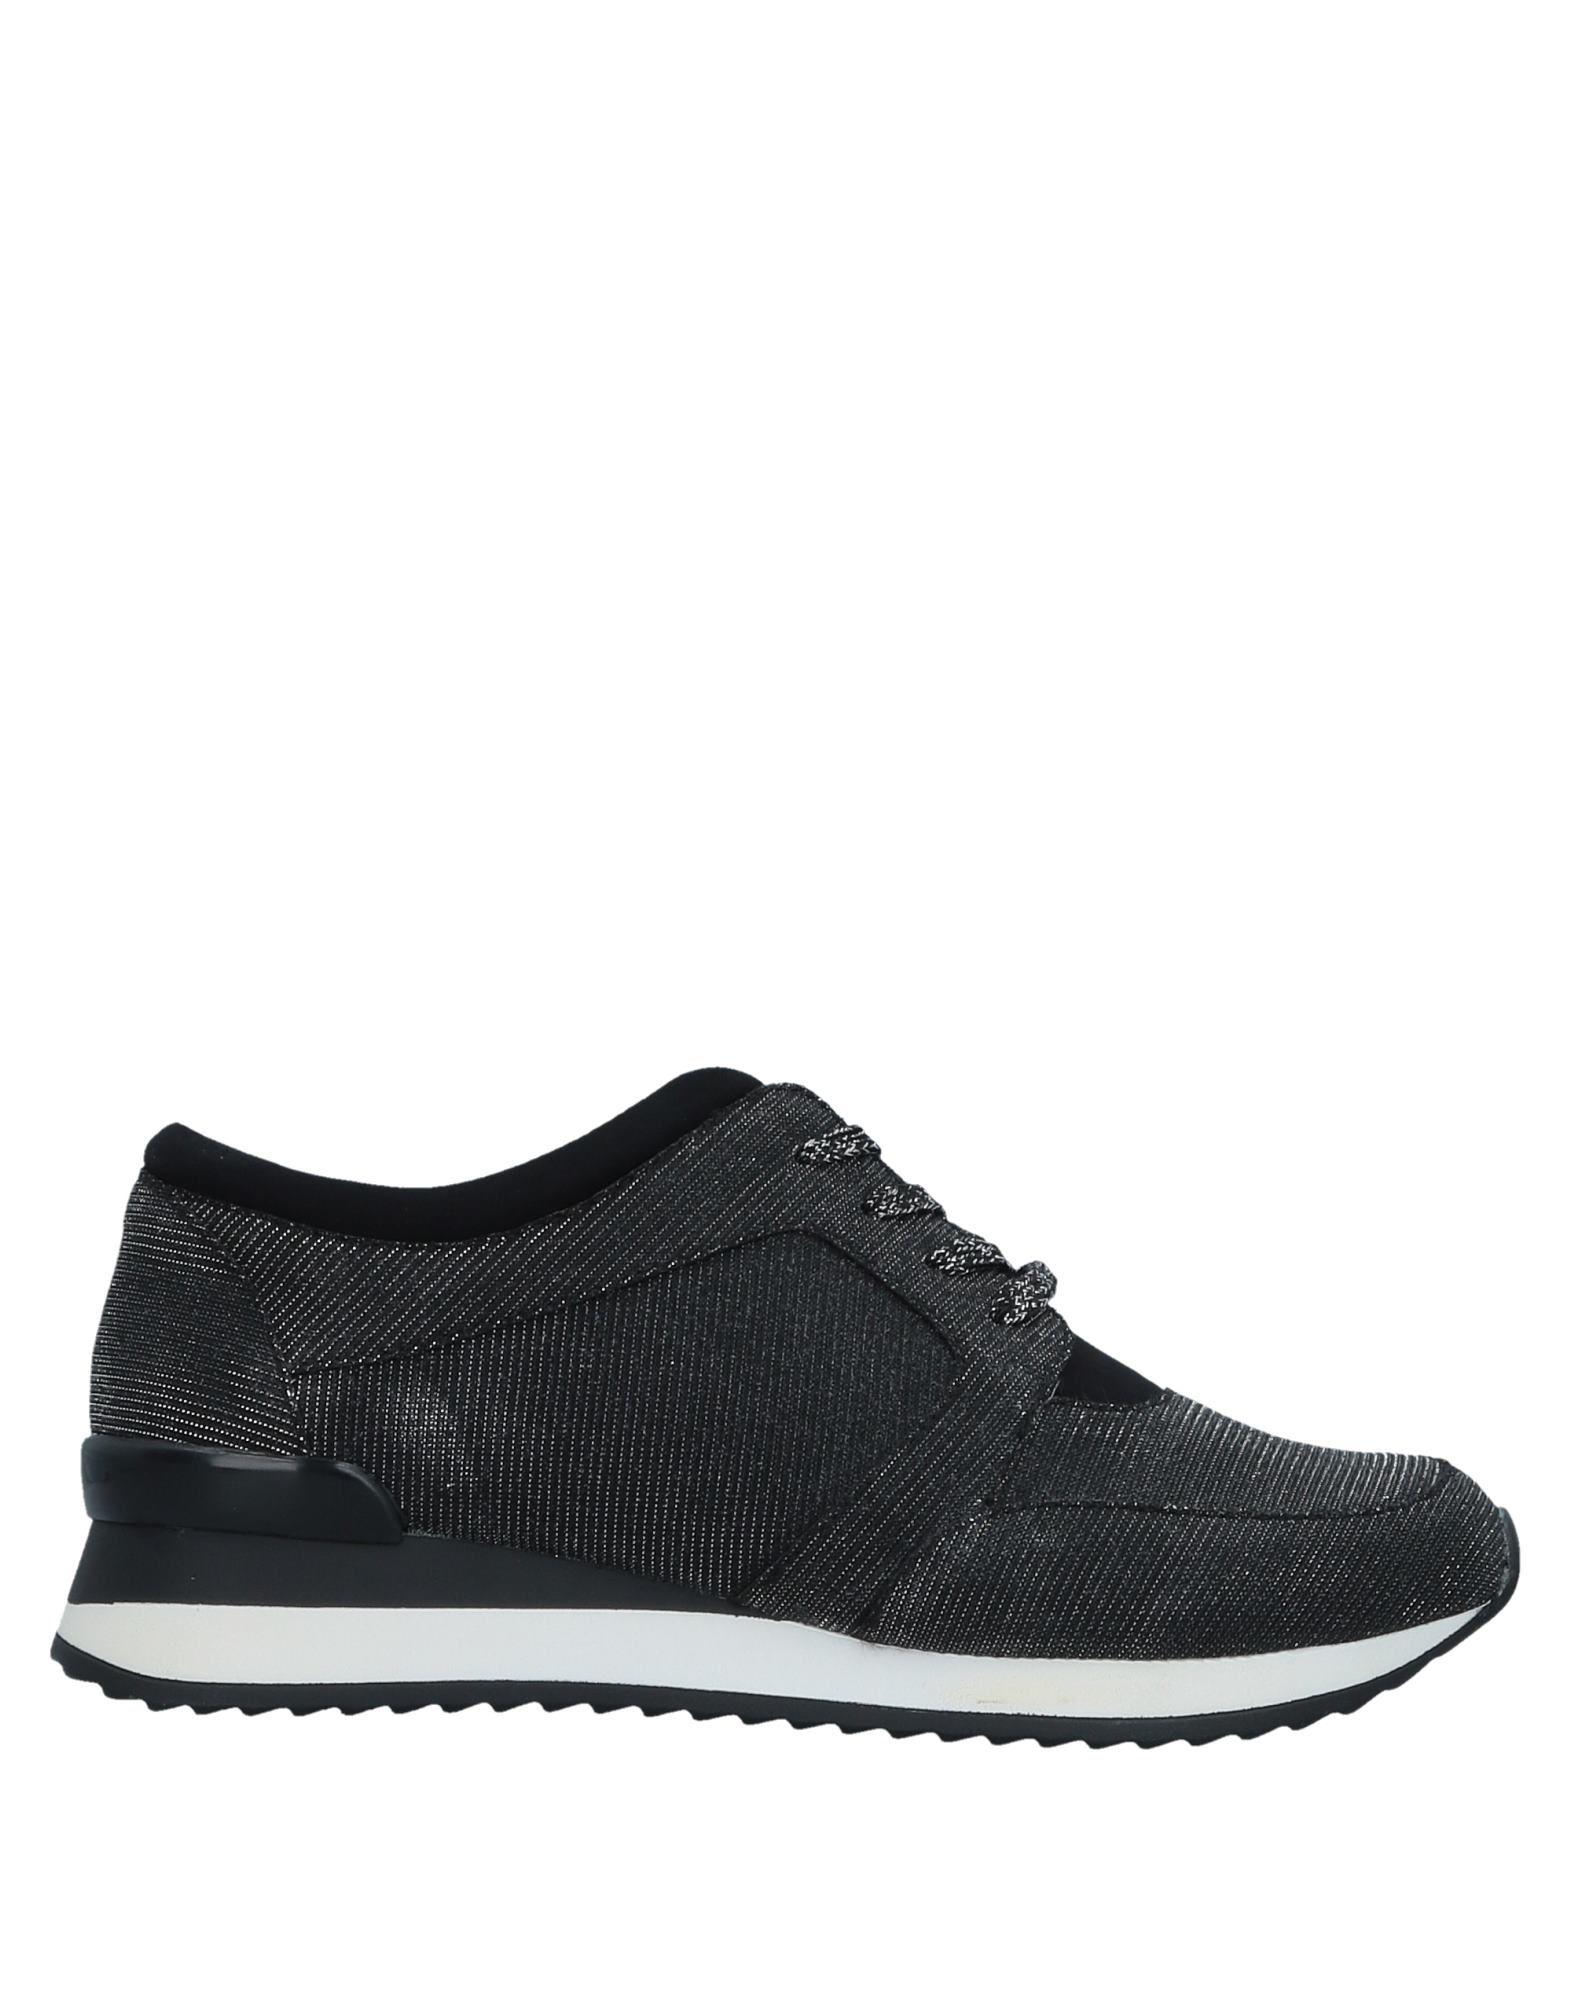 67 Sixtyseven Sneakers Damen  11523114MI Gute Qualität beliebte Schuhe